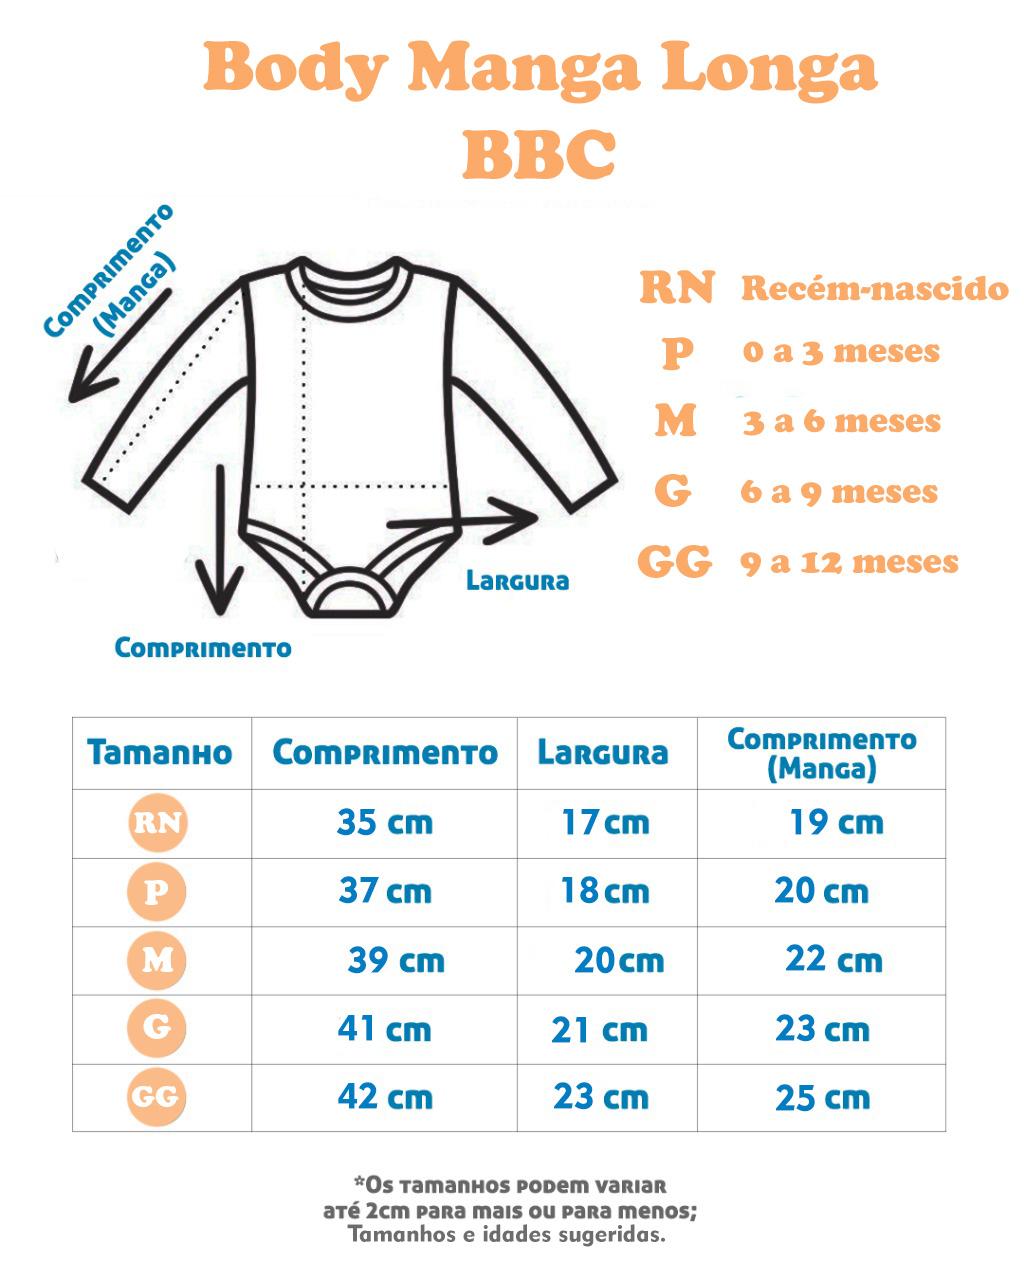 Body Manga Longa Barco (RN/P/M/G/GG)